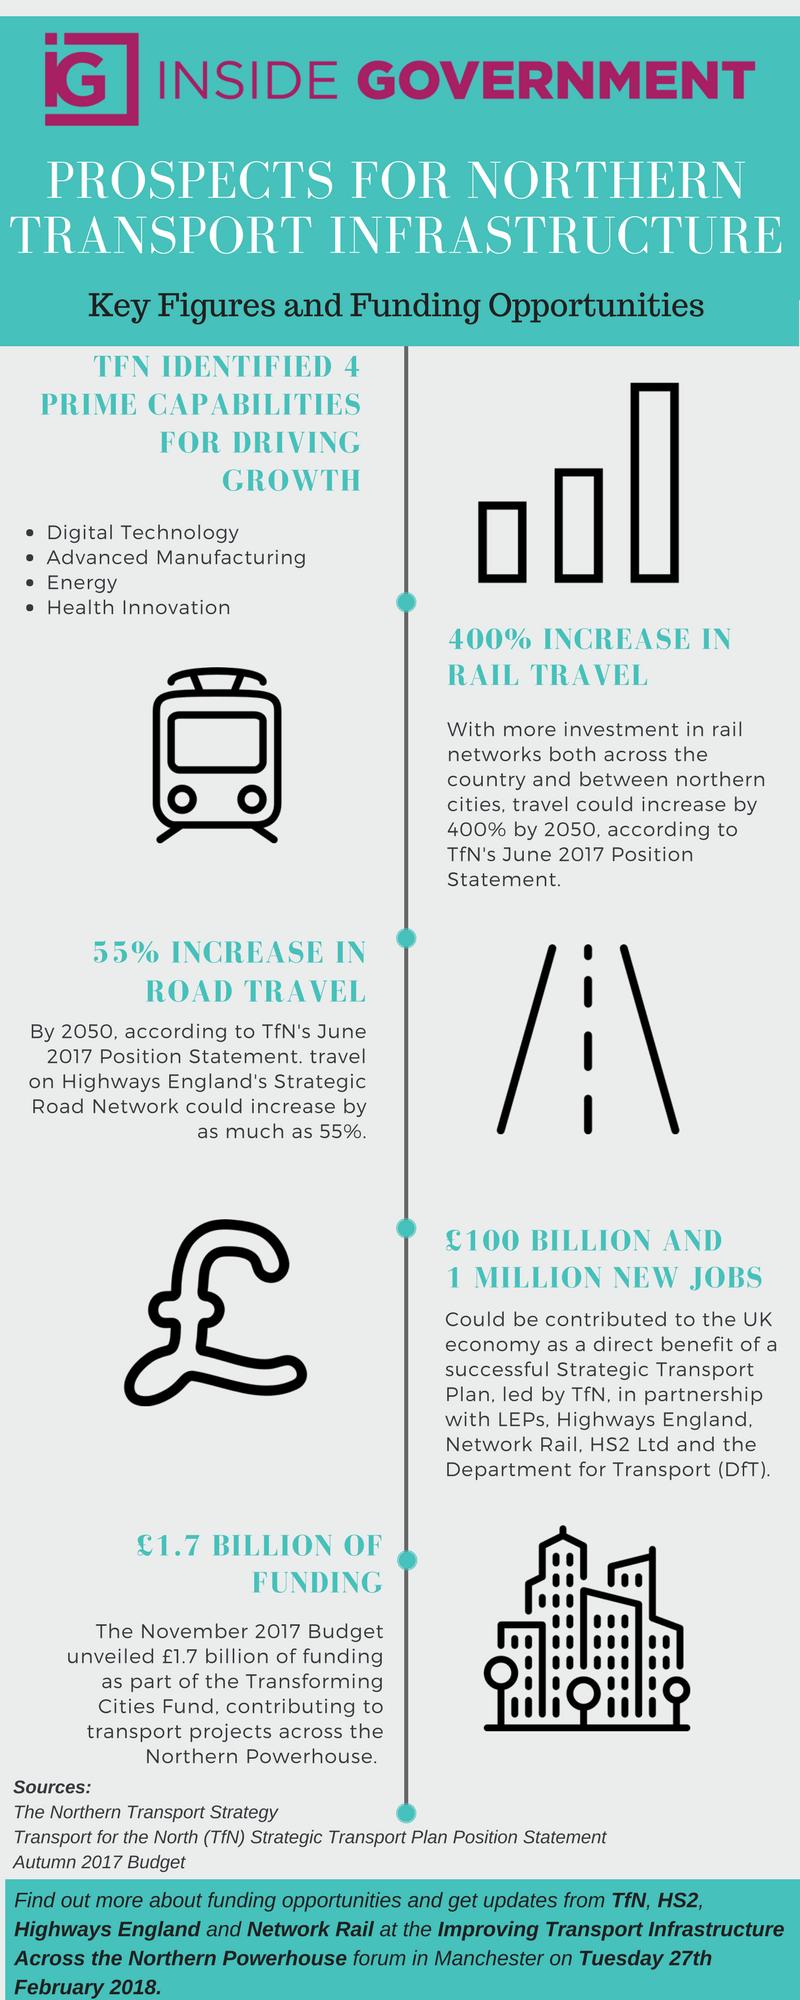 Improving northern Transport Infrastructure (9)